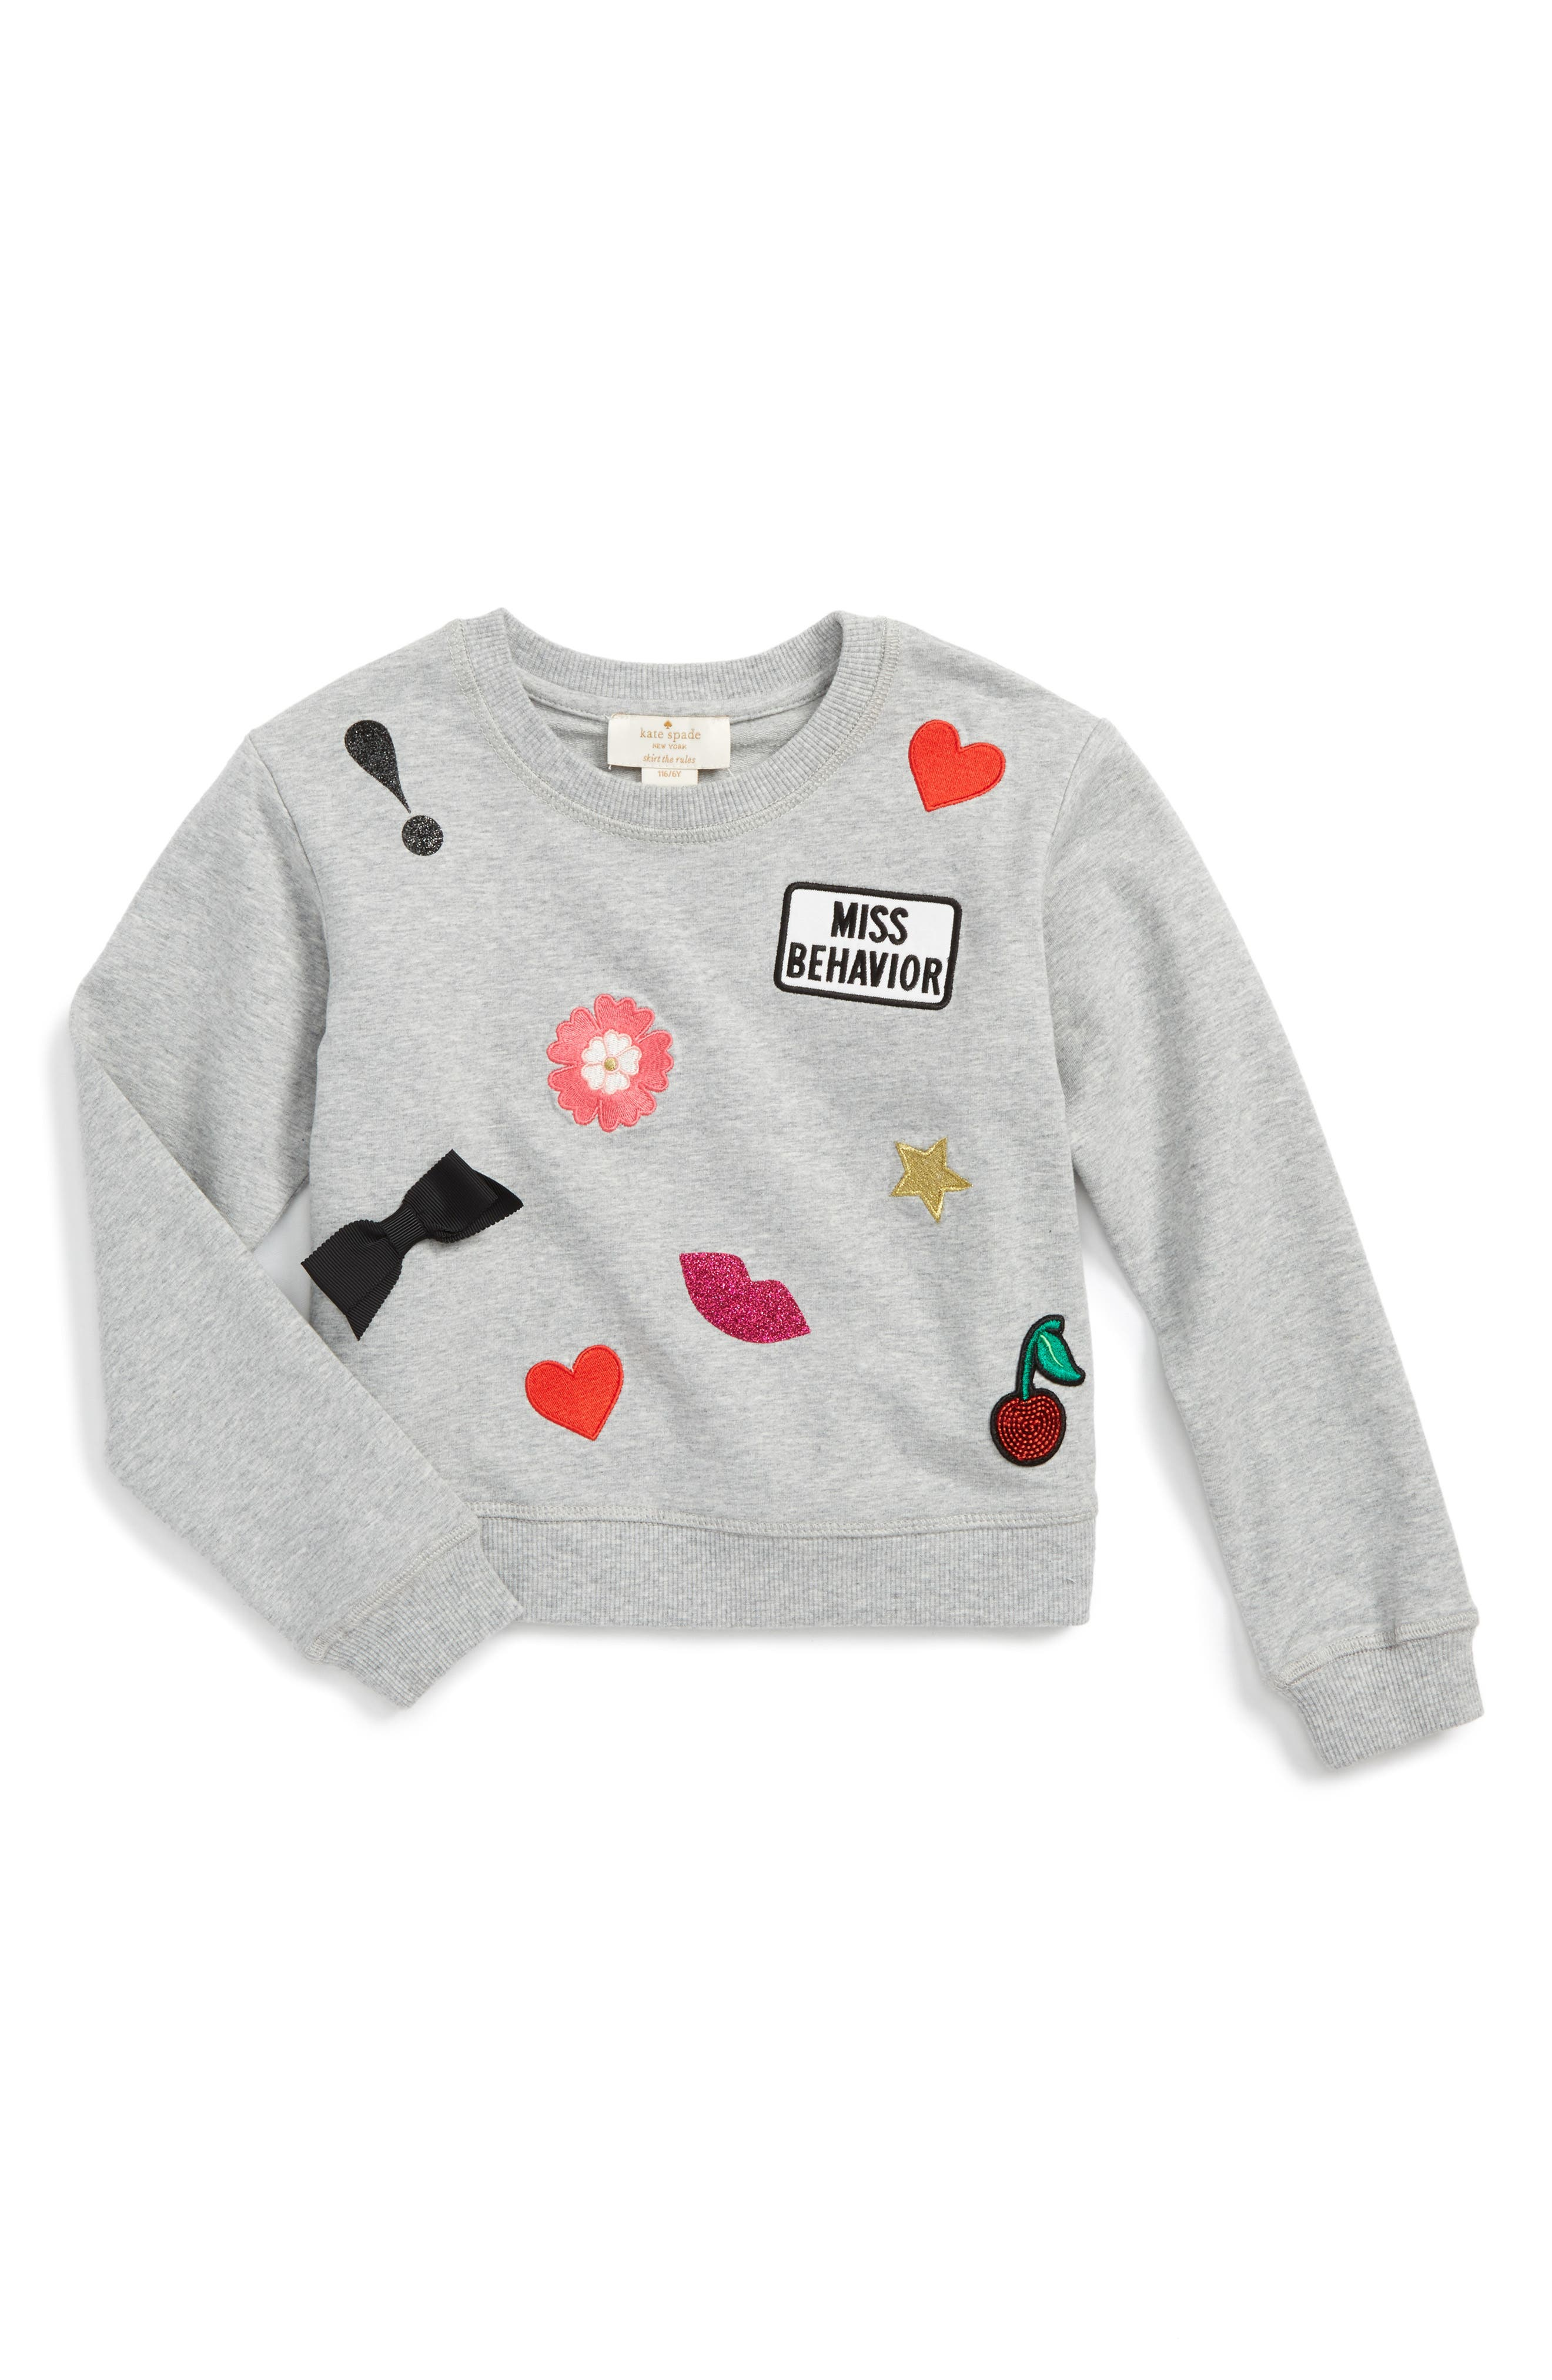 kate spade new york patched sweatshirt (Toddler Girls & Little Girls)